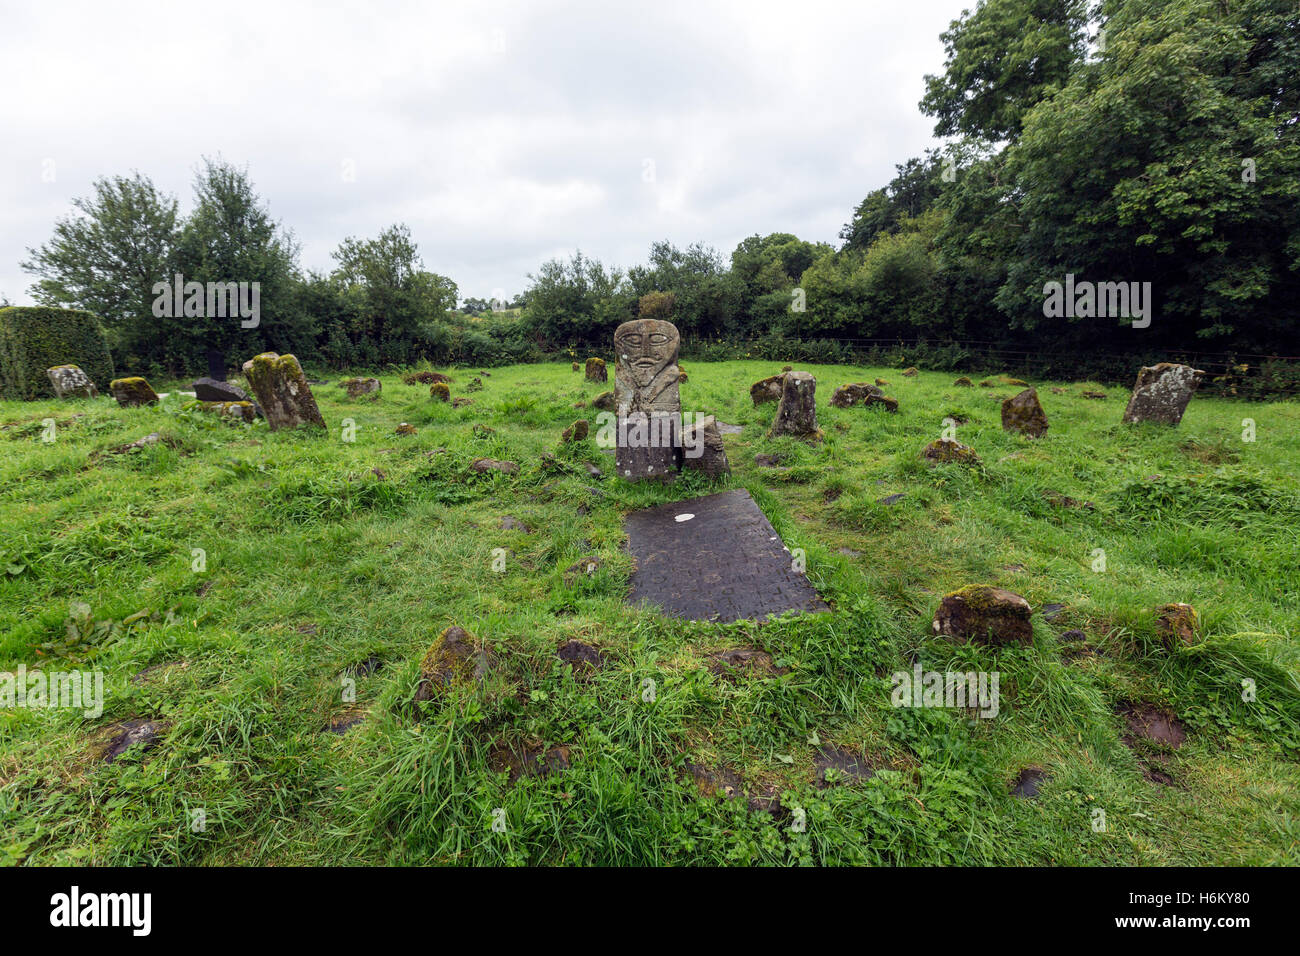 The bilateral Boa Island figure at Caldragh graveyard, Boa Island, Northern Ireland, UK - Stock Image